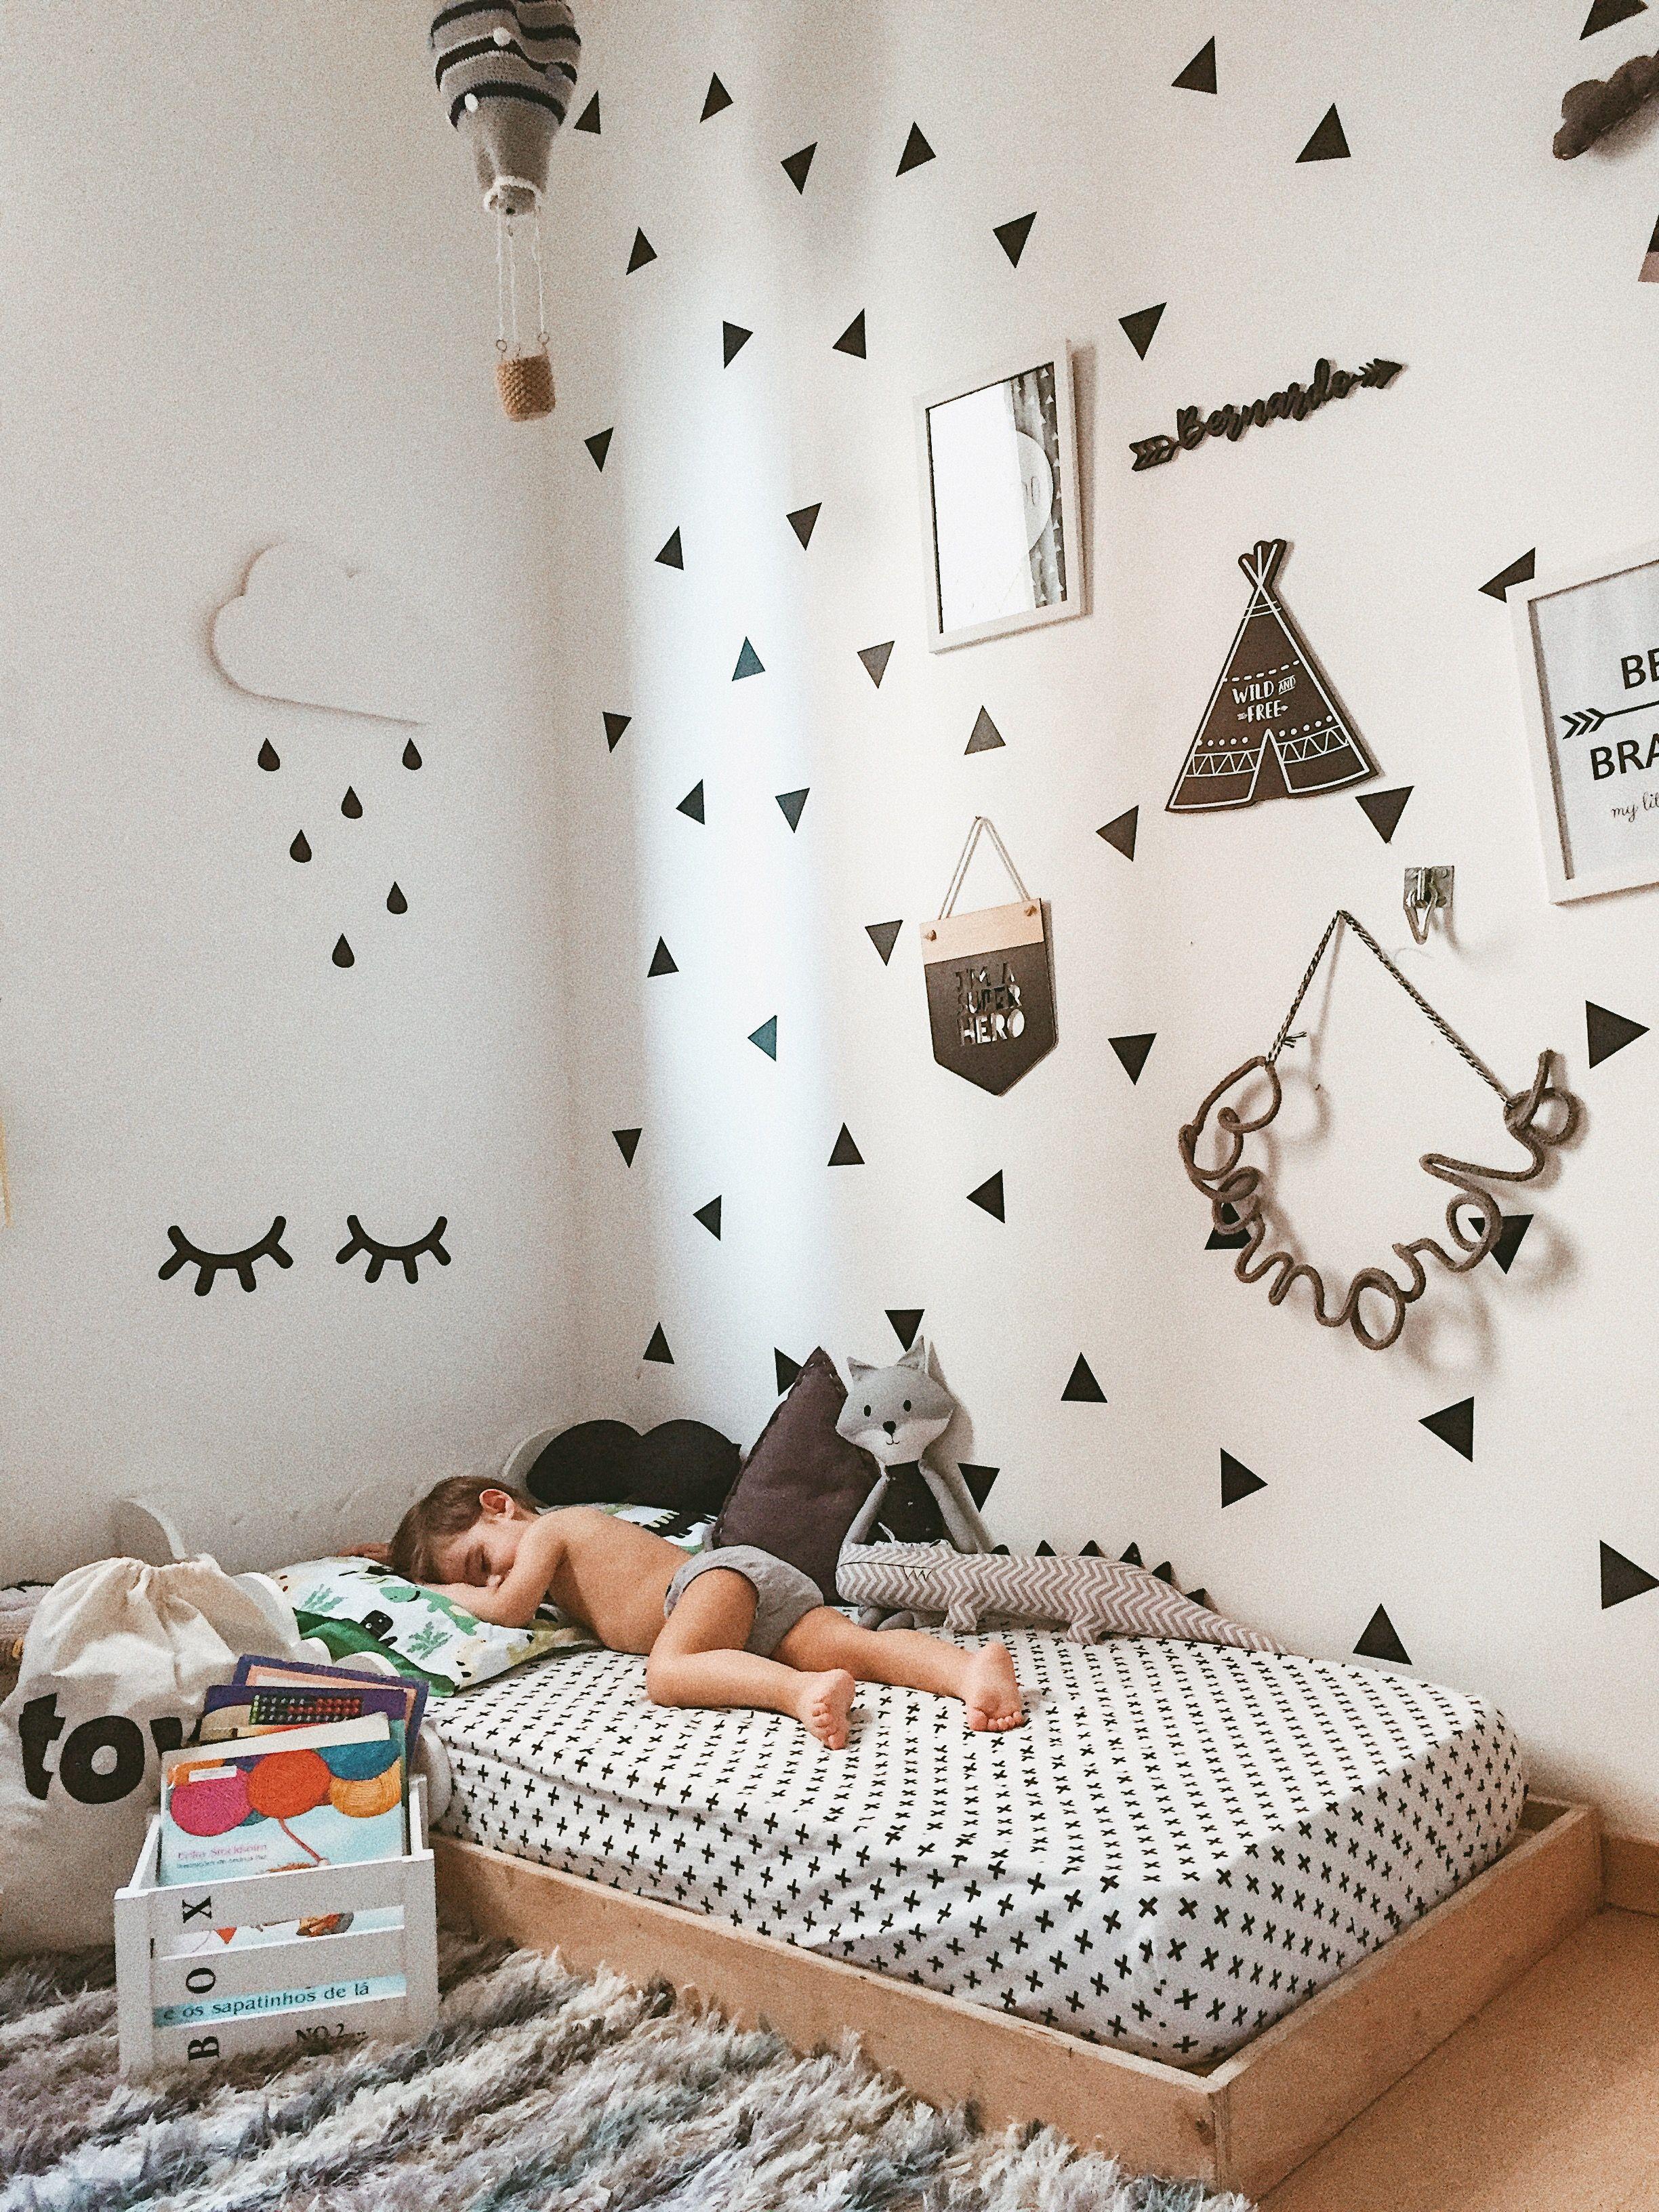 Decoração quarto montessoriano #ikeakinderzimmer